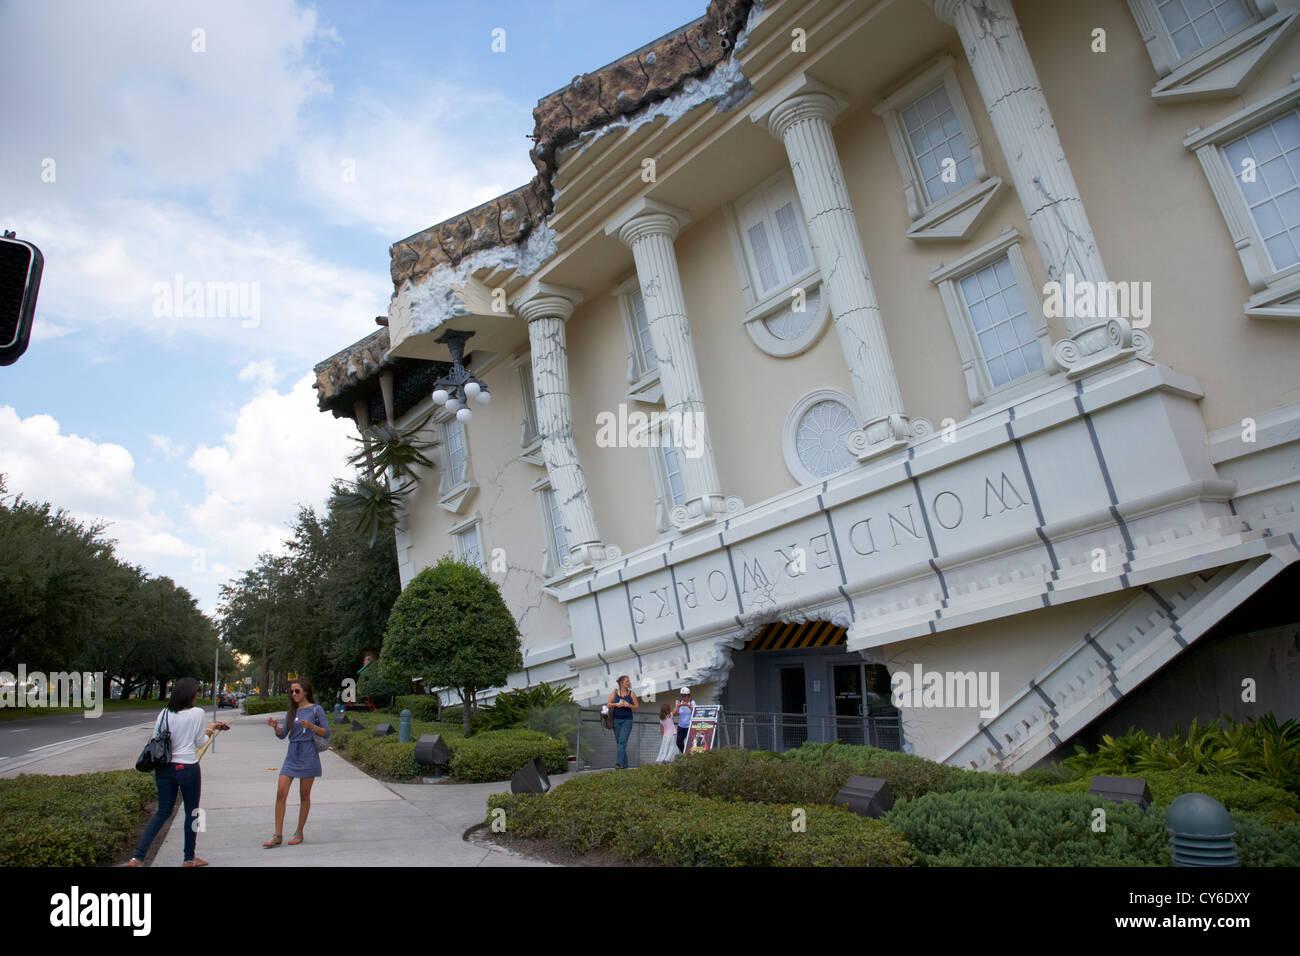 WonderWorks Touristenattraktion am International drive Orlando Florida usa Stockbild